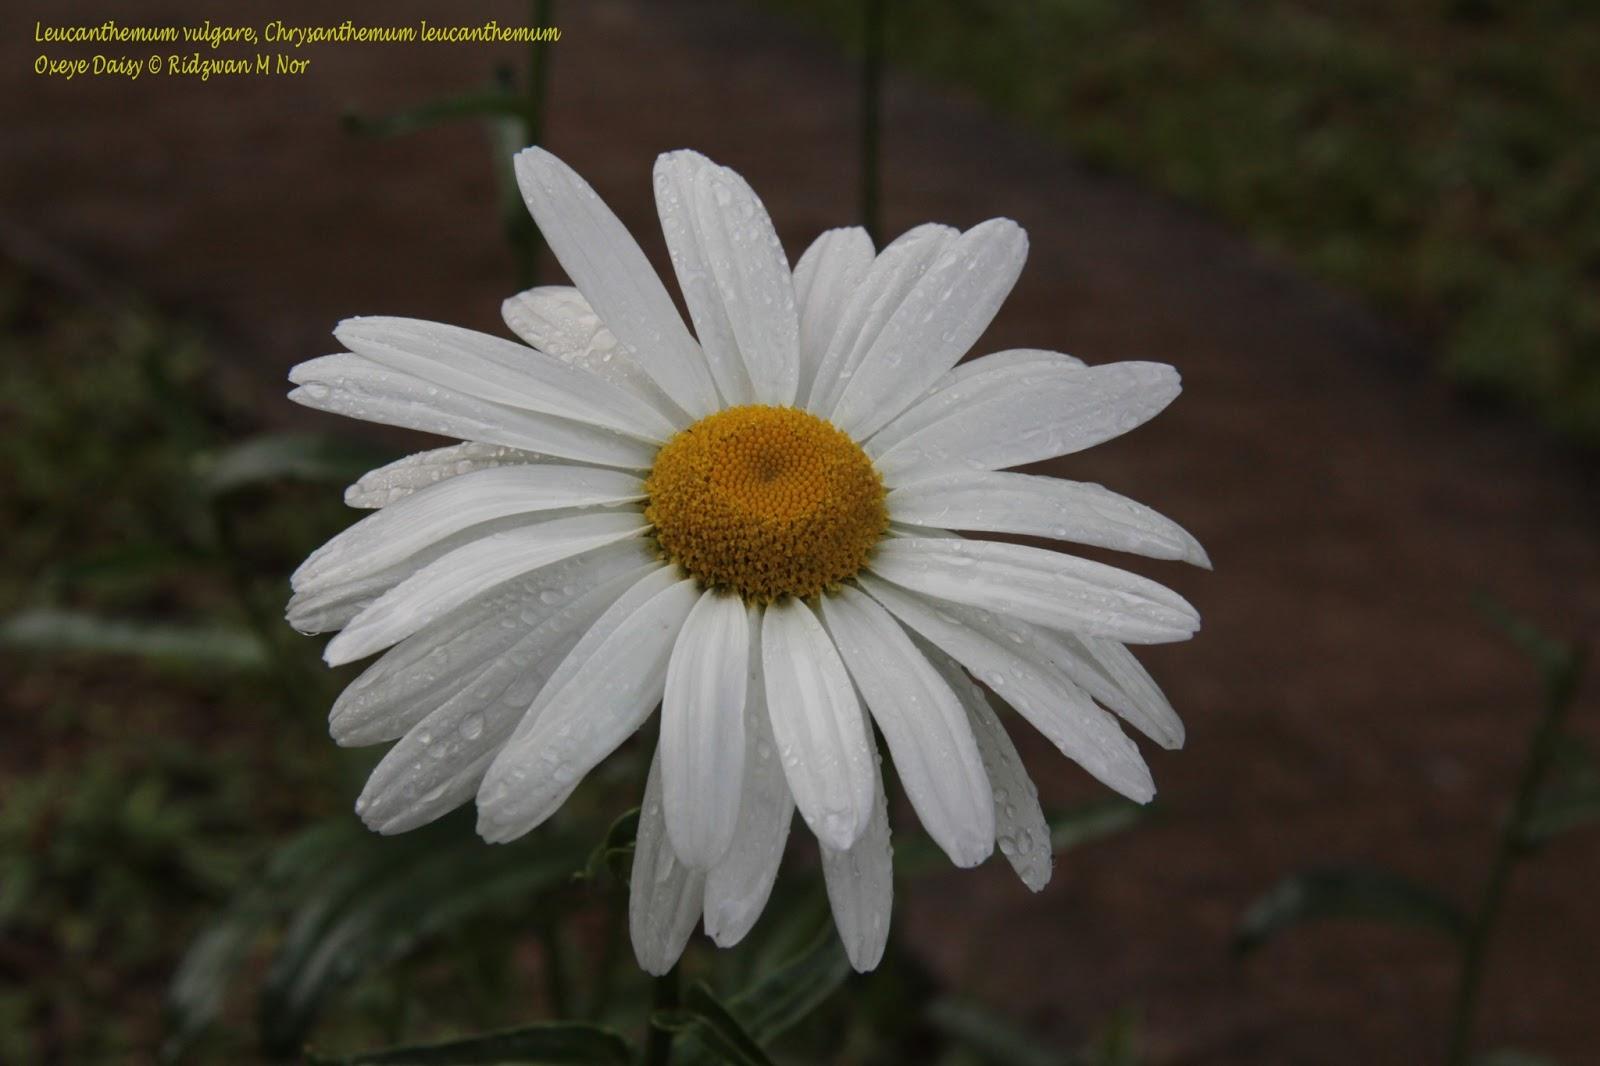 Leucanthemum vulgare chrysanthemum leucanthemum oxeye daisy leucanthemum vulgare chrysanthemum leucanthemum oxeye daisy izmirmasajfo